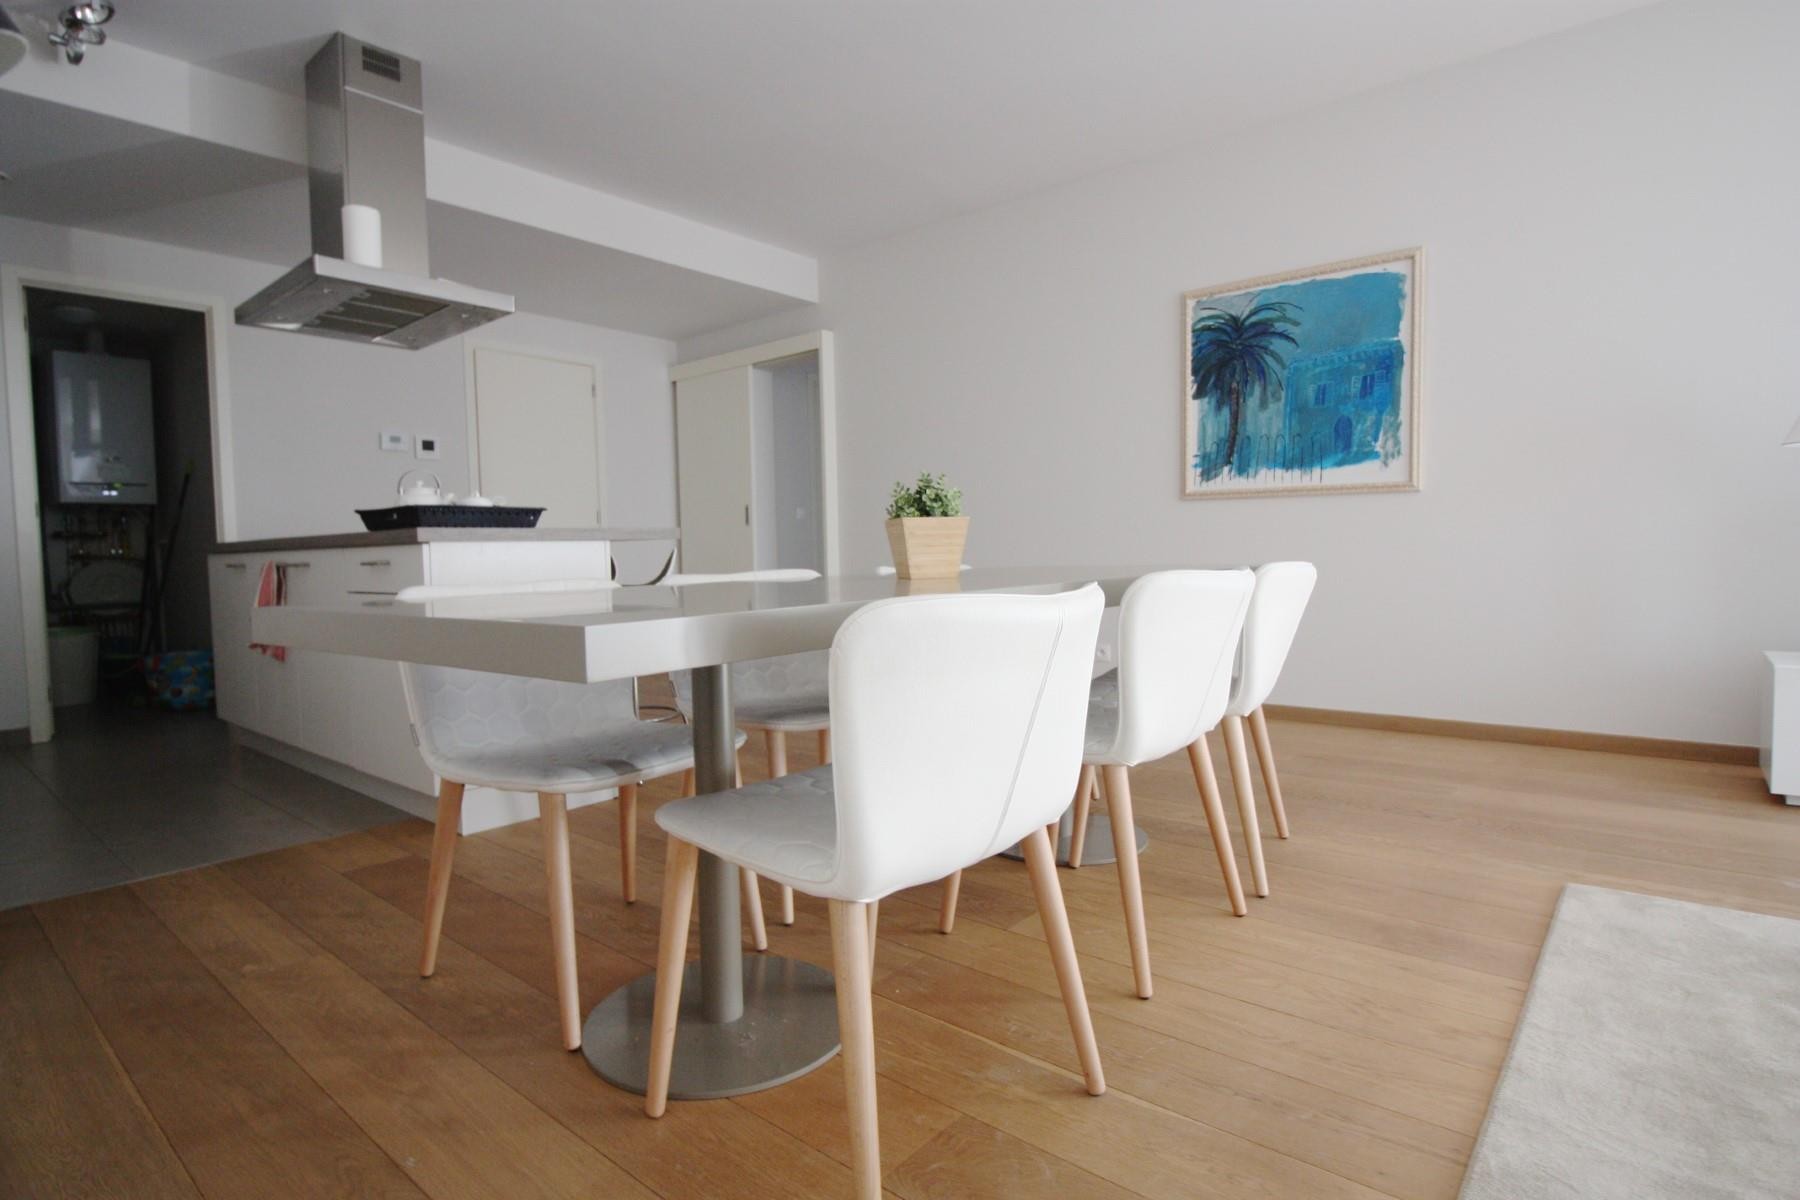 Flat - Etterbeek - #4527457-8